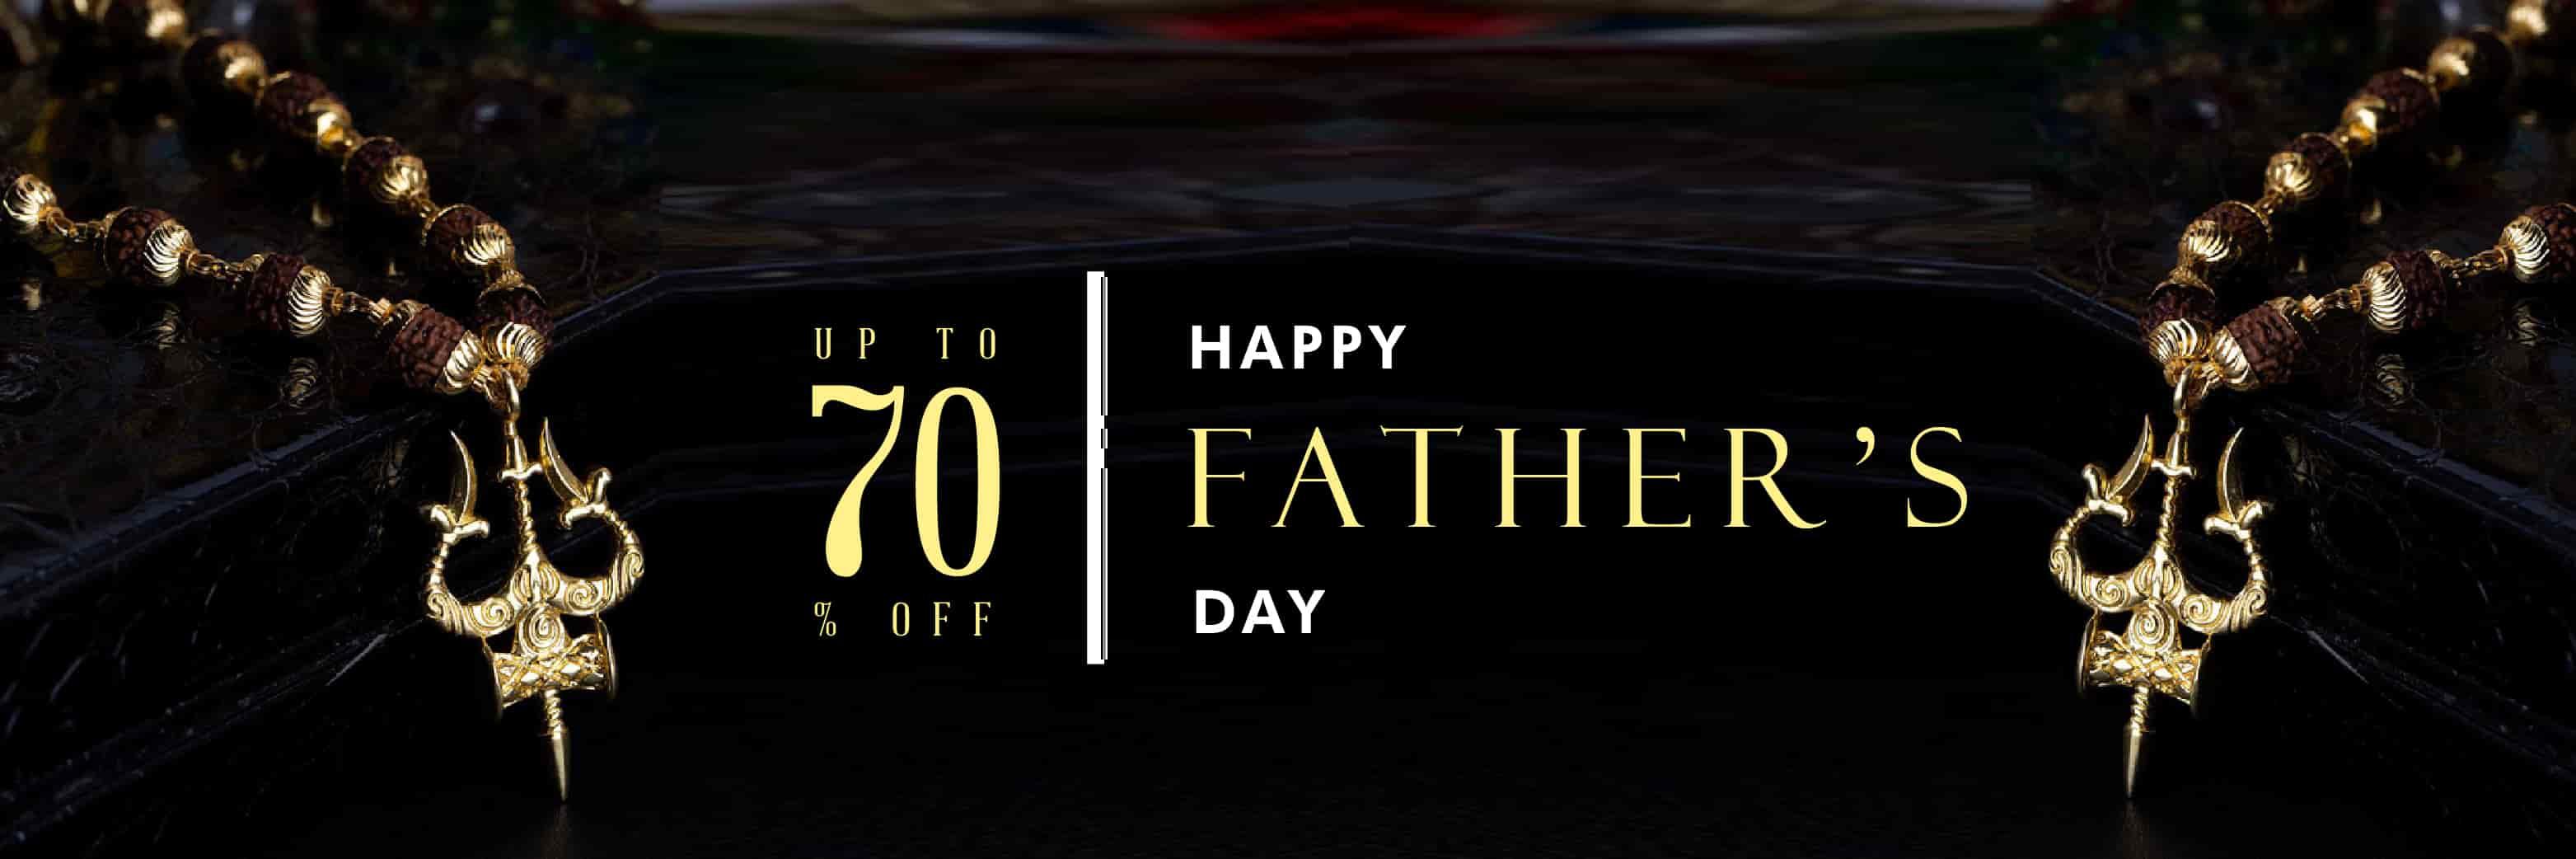 voylla.com - Upto 70% Off on Designer Father's Day Jewelry